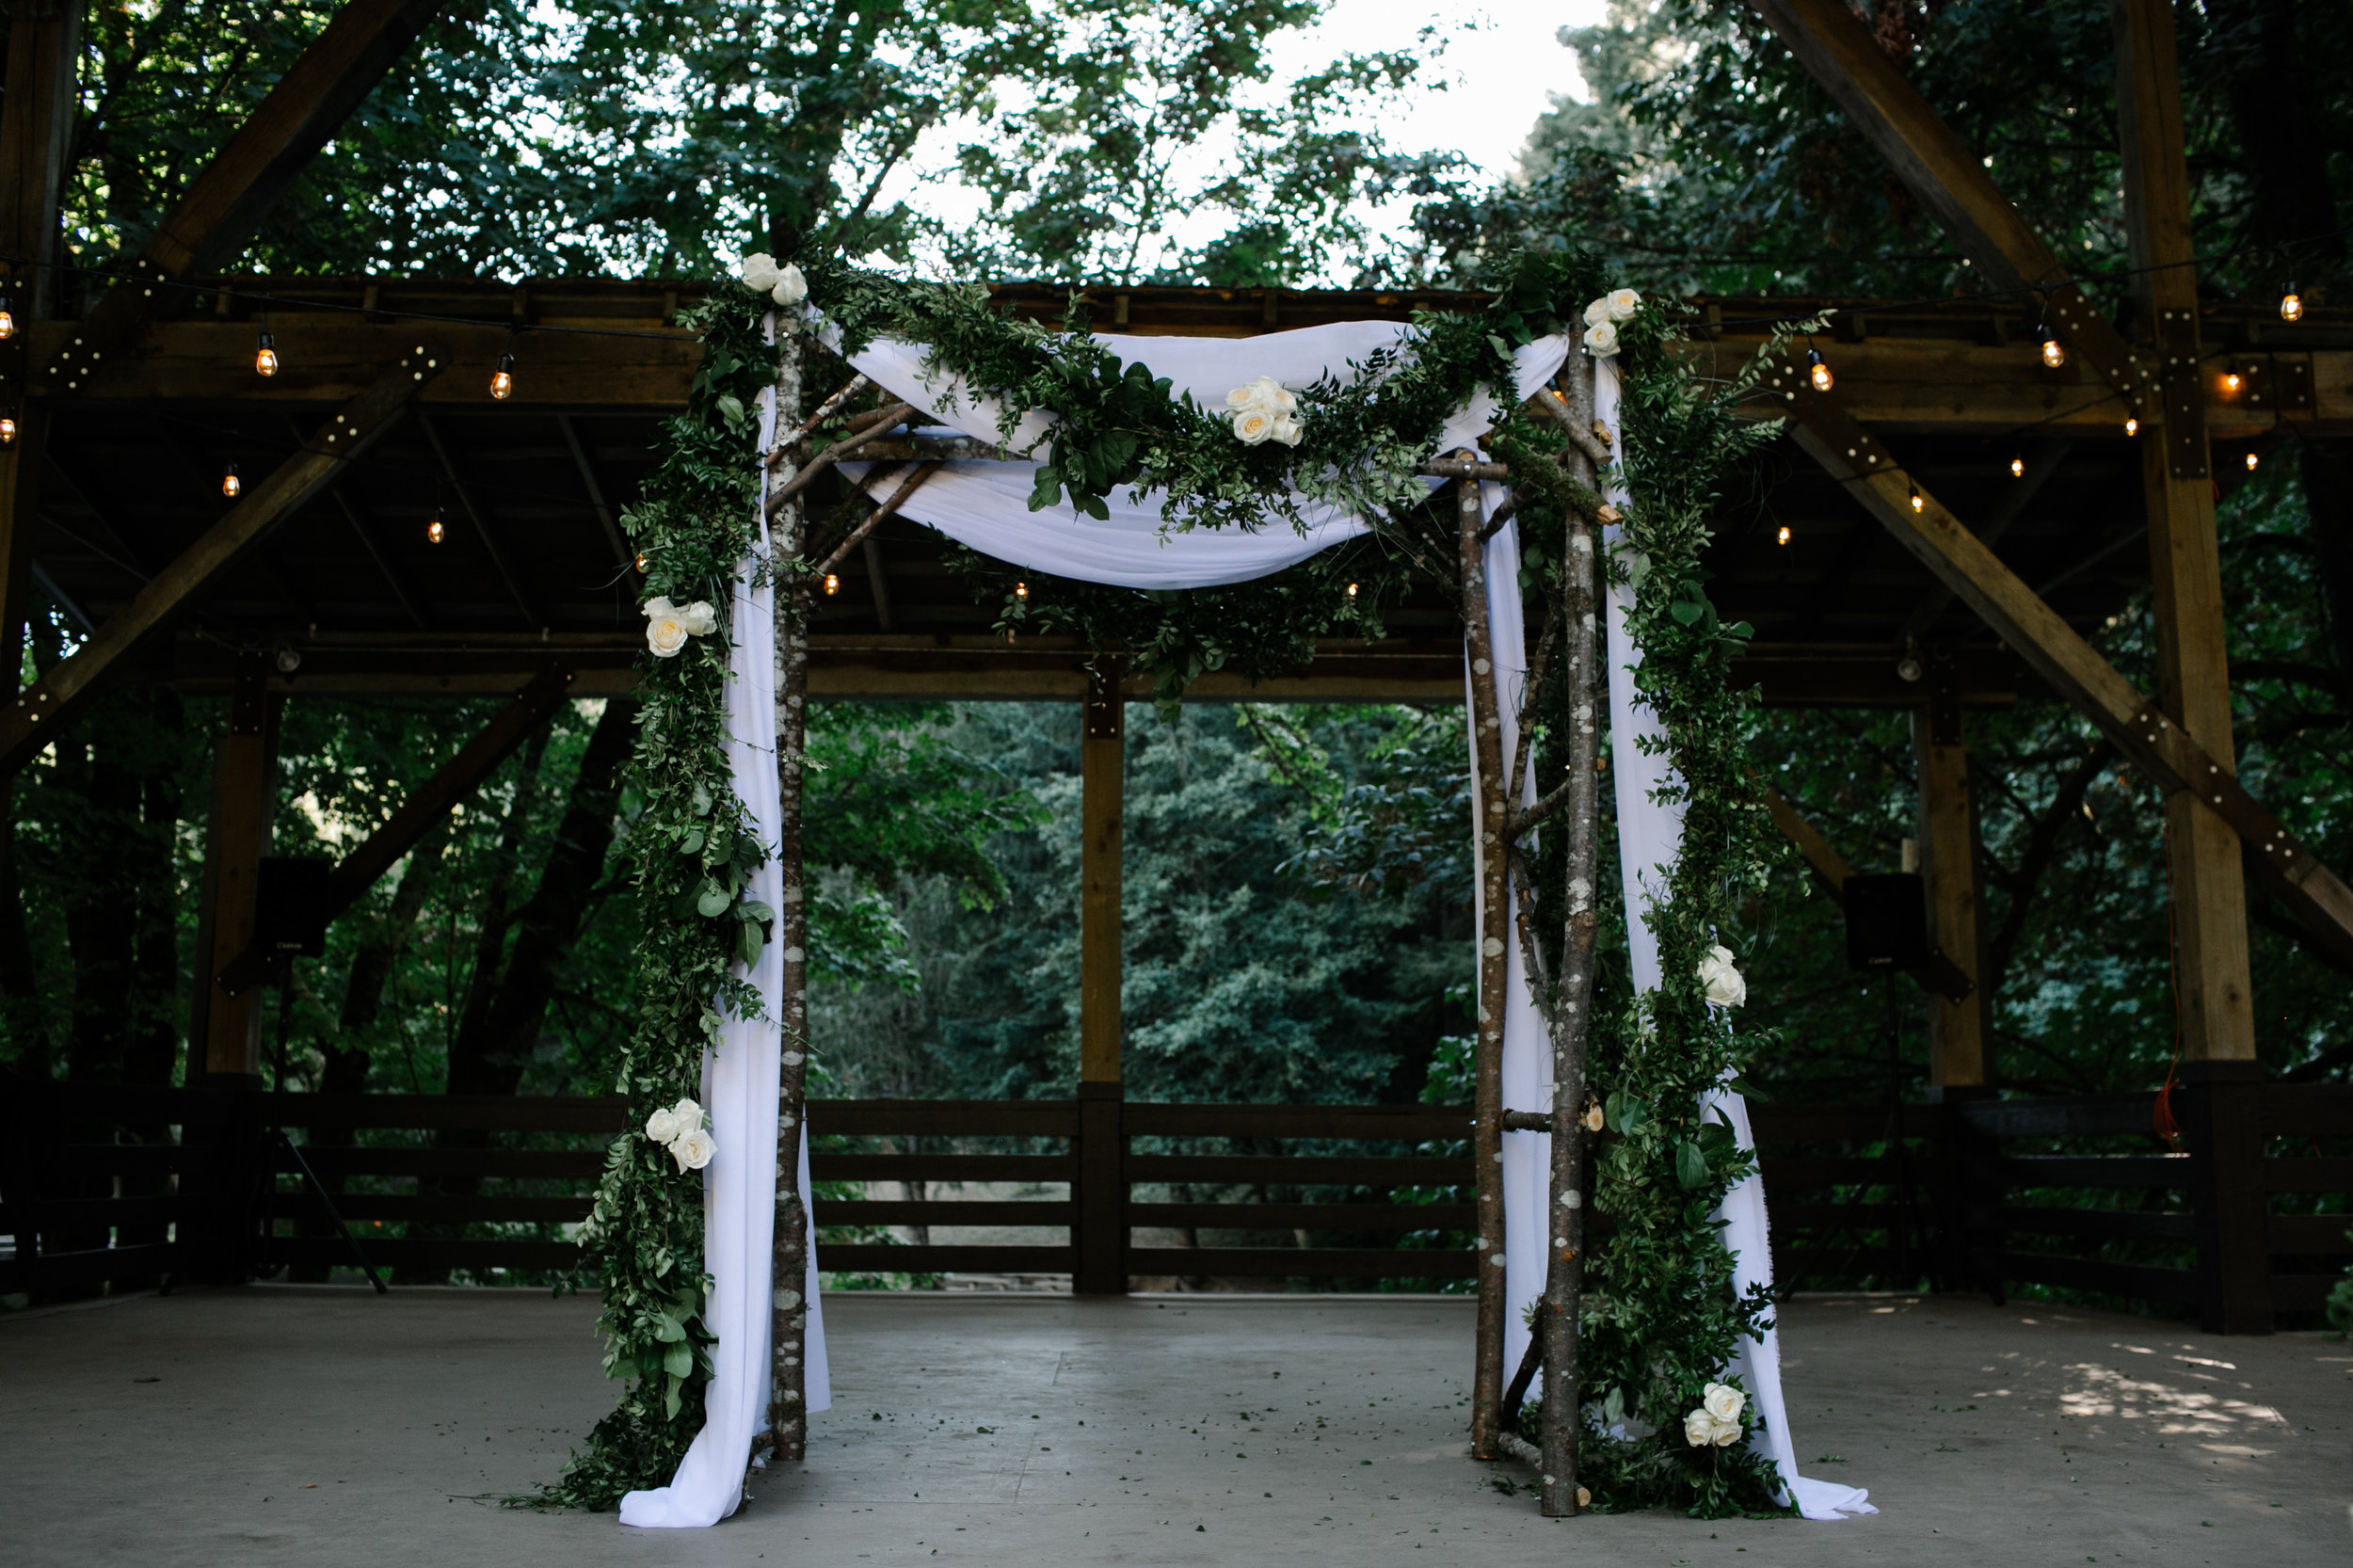 Sevlynn-Photography-Teresa-Chandler-Wedding-39.jpg